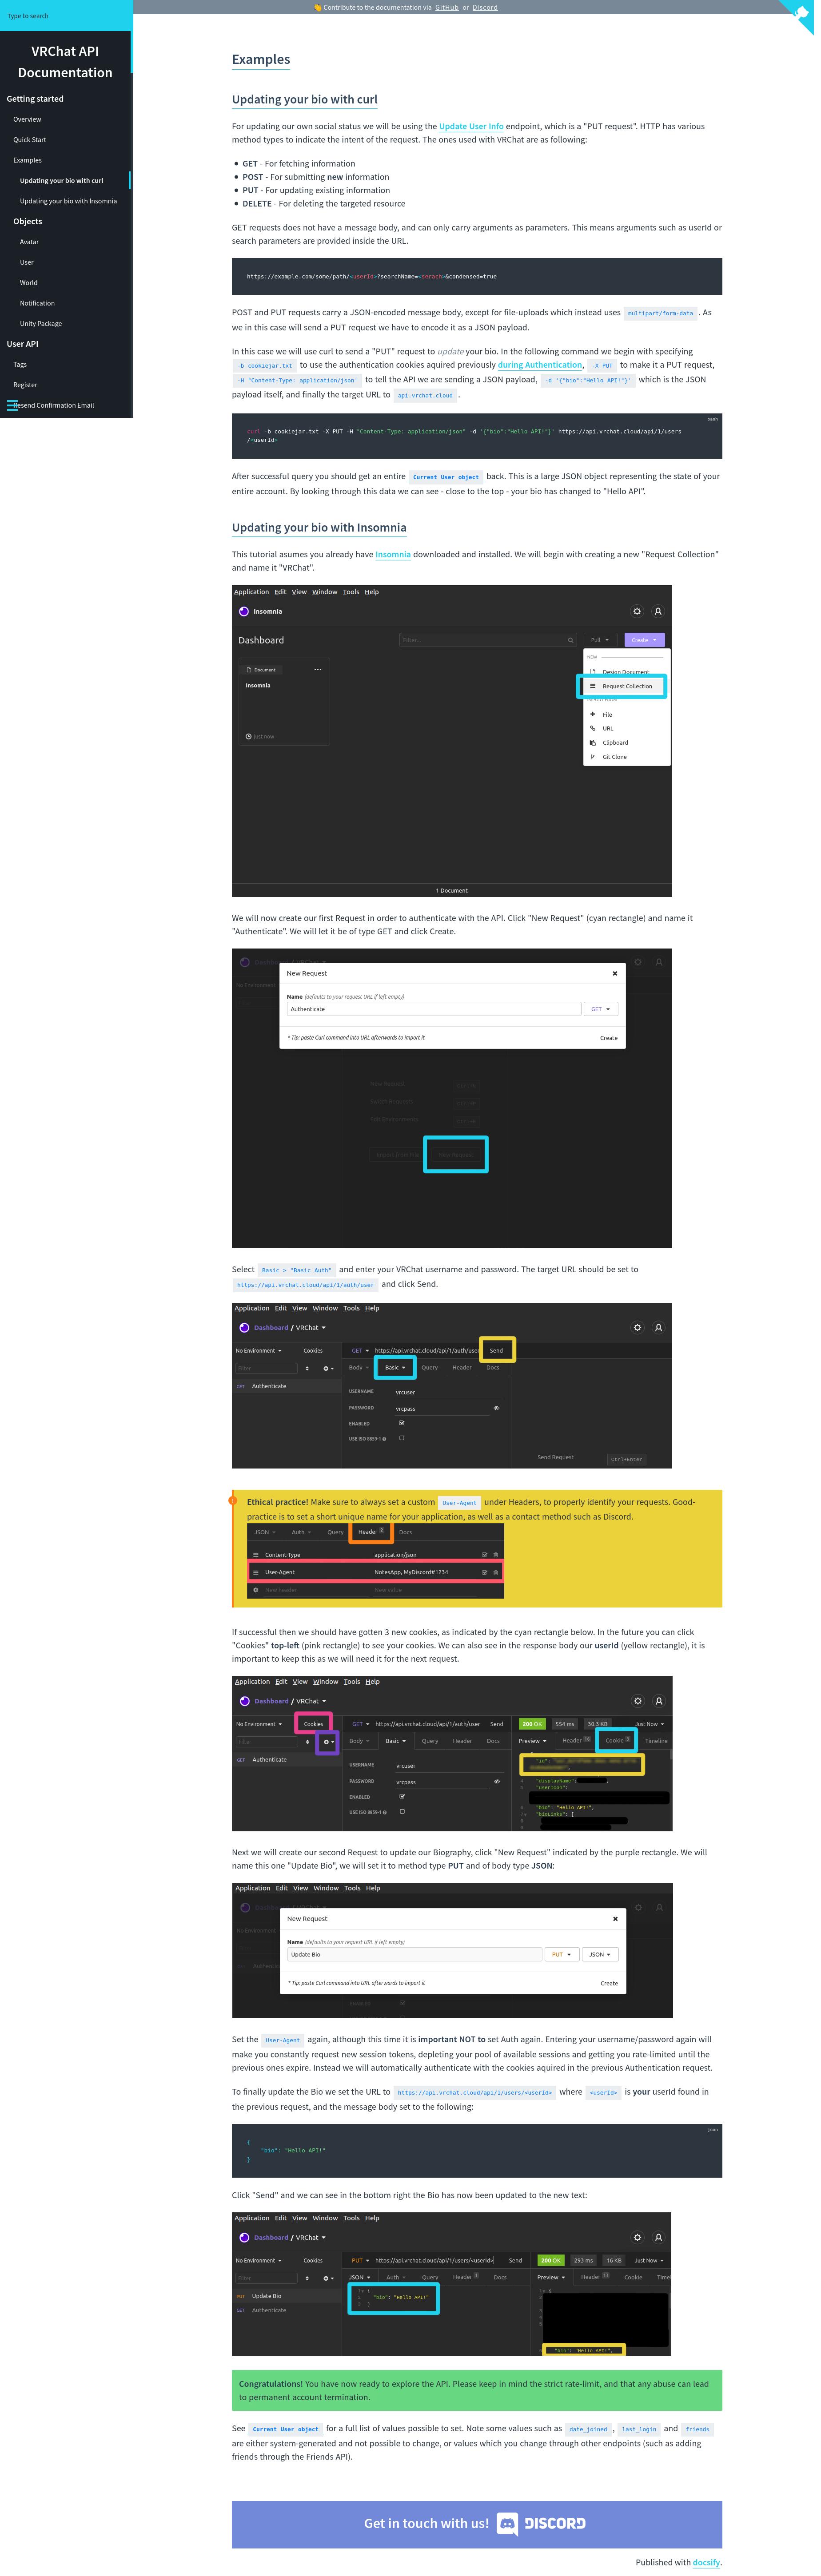 Screenshot_2021-04-24 Examples